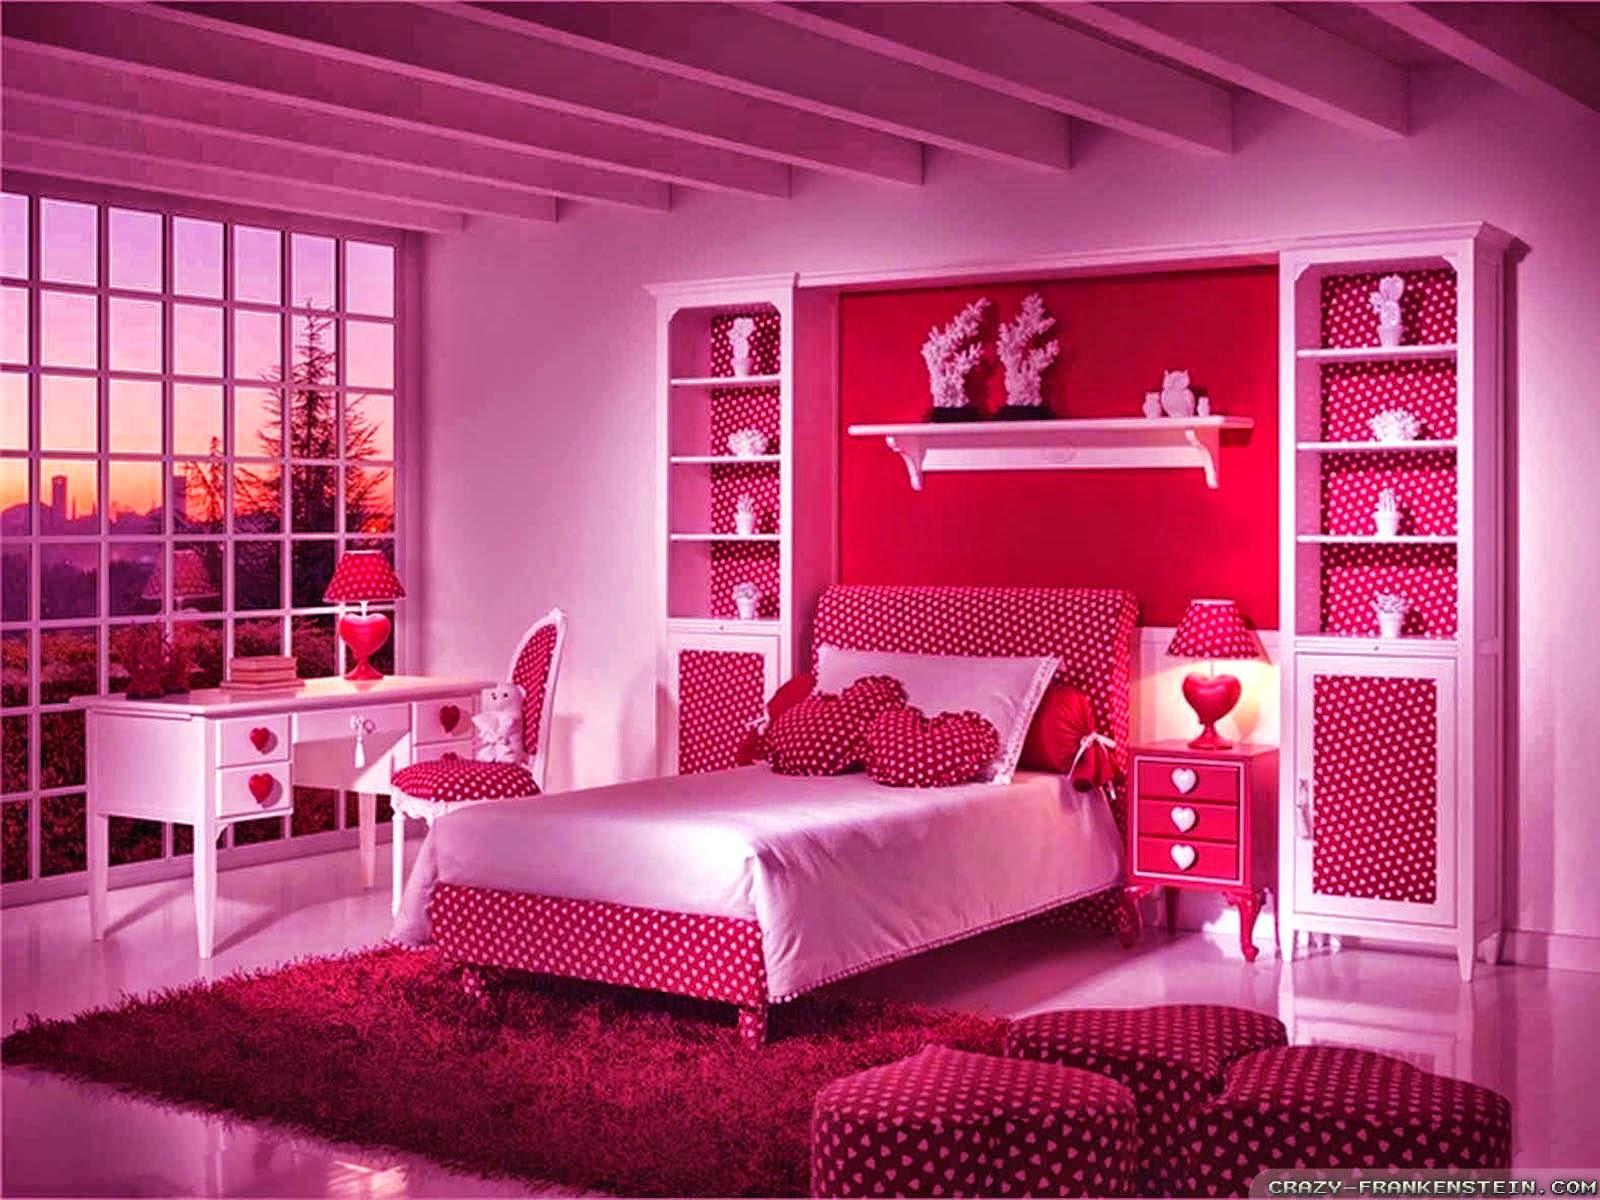 Heart Bedroom Decorating Ideas Entertainment News